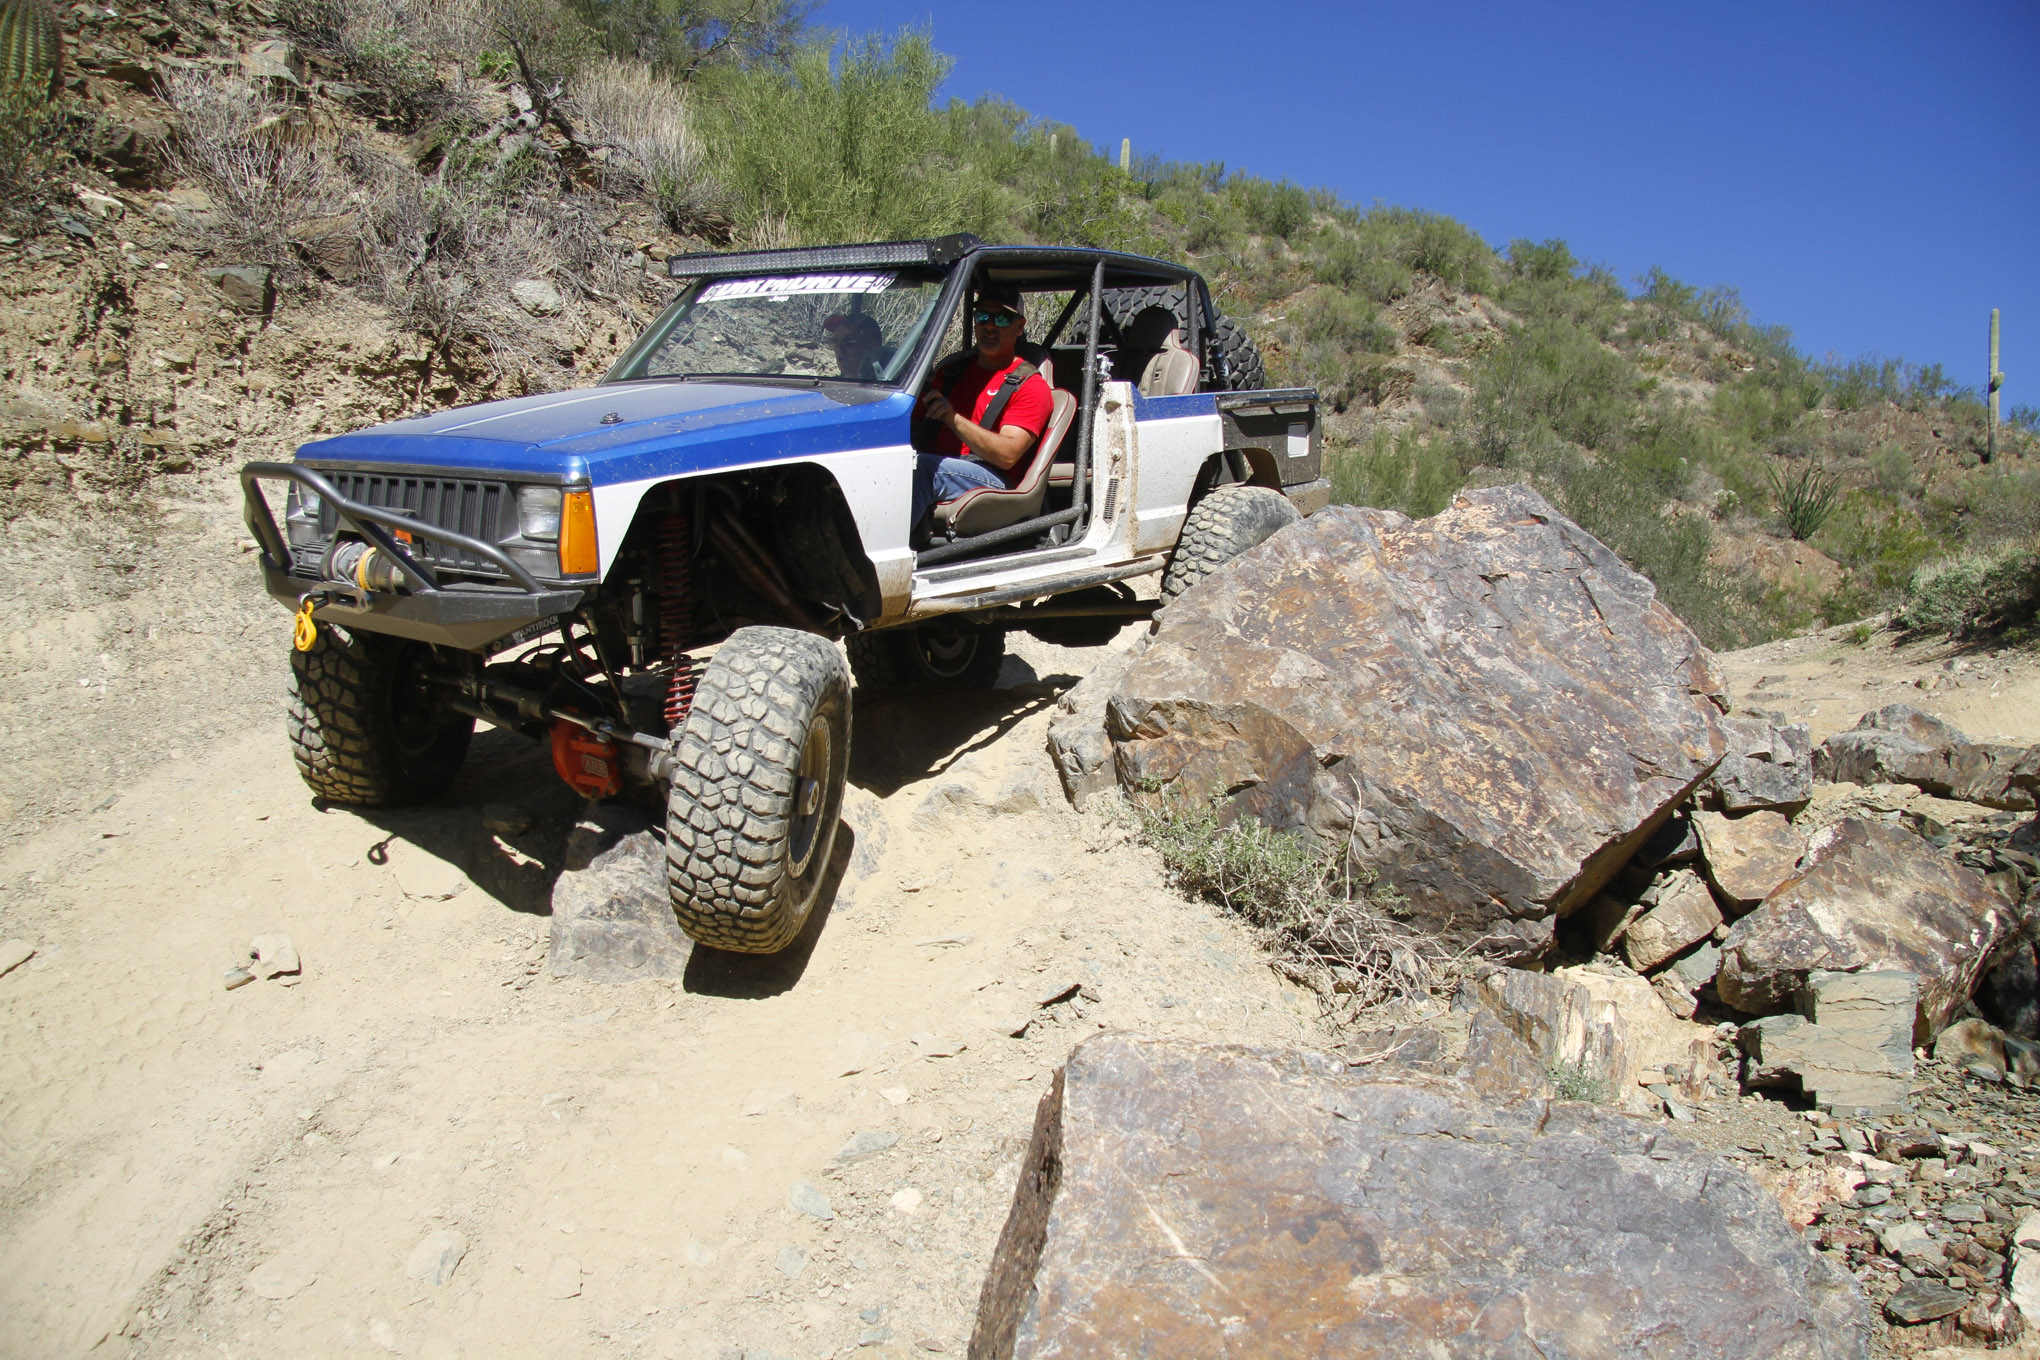 026 table mesa trails down anaconda boulders 1984 jeep xj cherokee